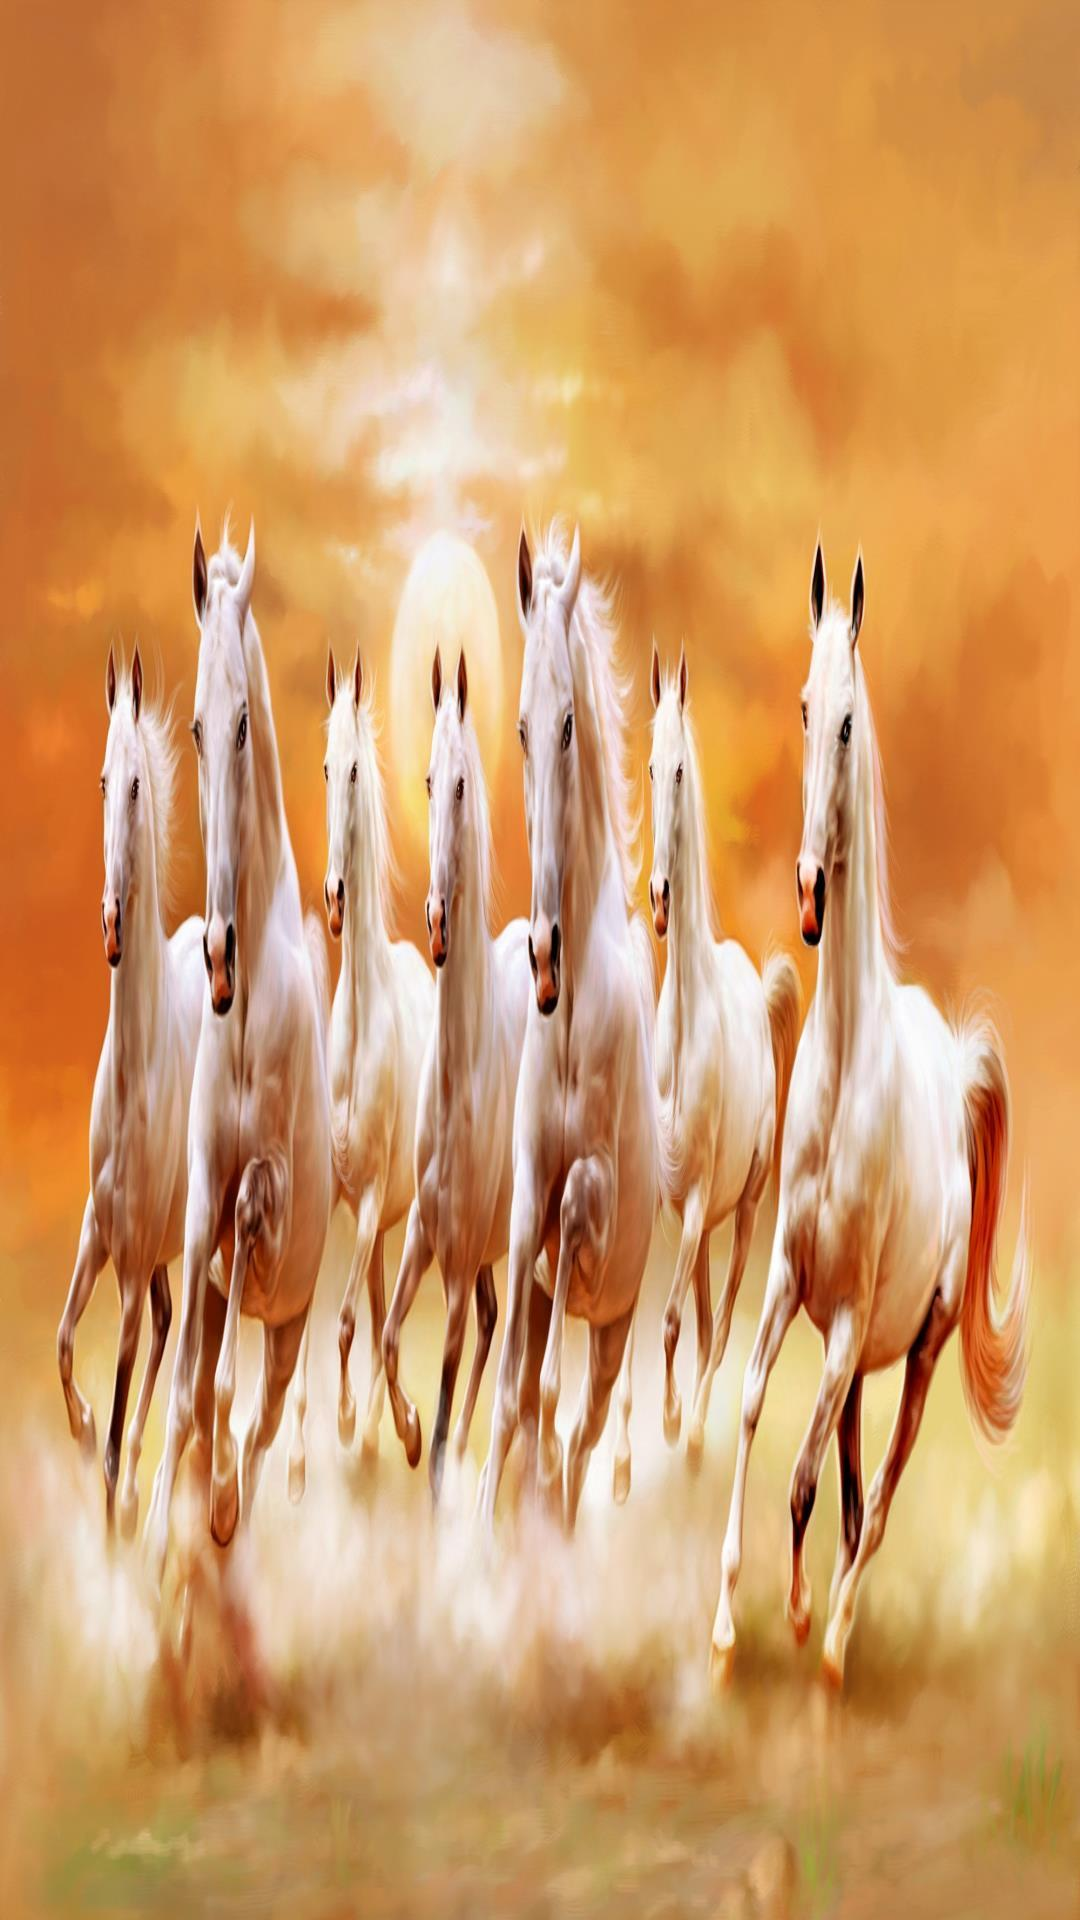 Horse Wallpaper Hd Posted By Sarah Mercado